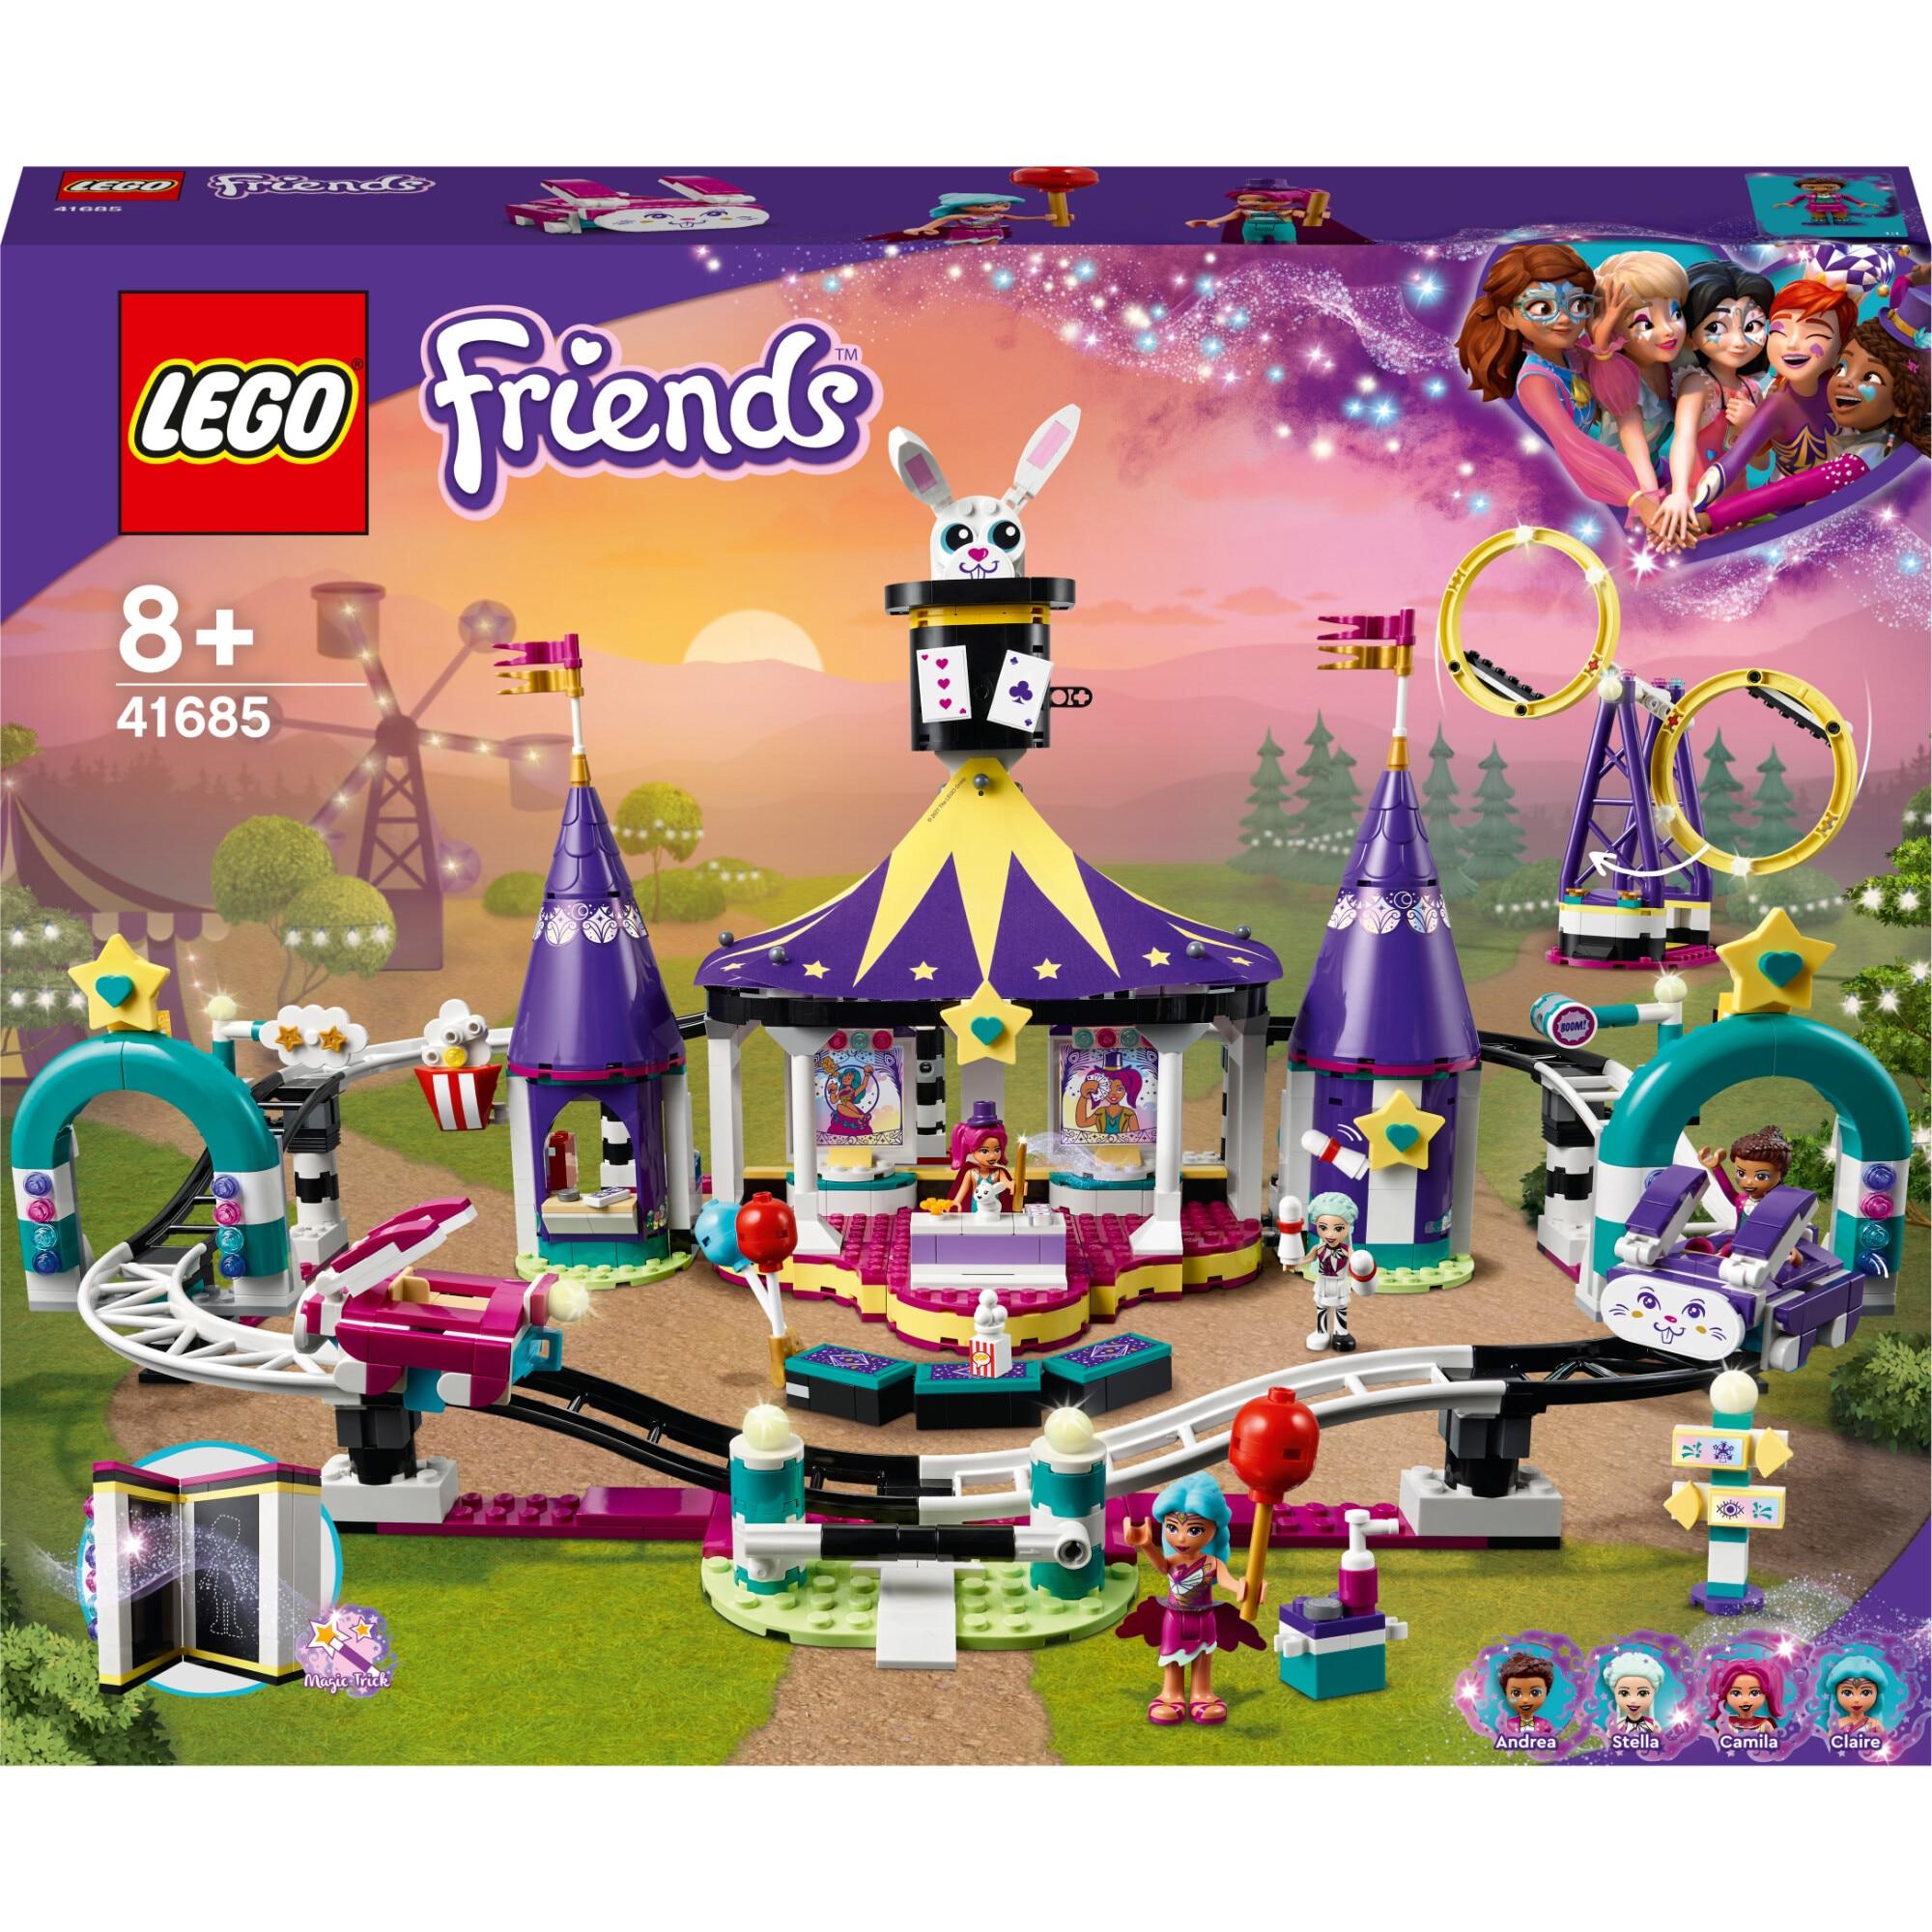 Fotografie LEGO Friends - Montagne russe magic in parcul de distractii 41685, 974 piese